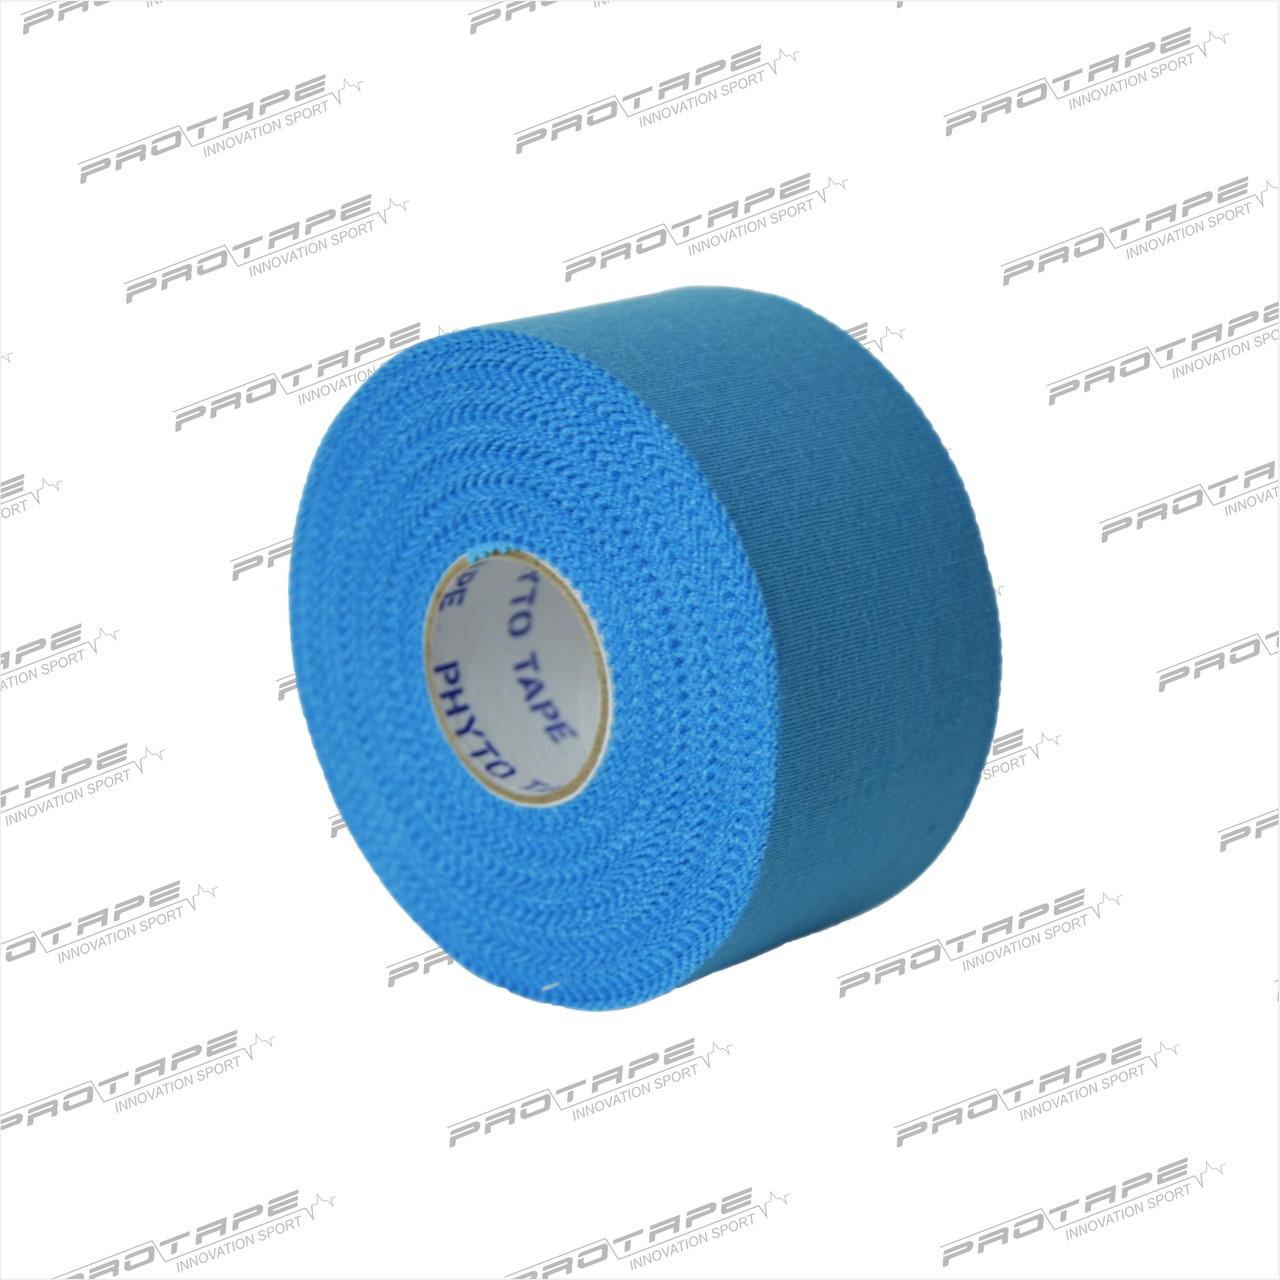 Тейп Голубой Phyto tape 501 Colored tape 3,8 см х 13,7 м